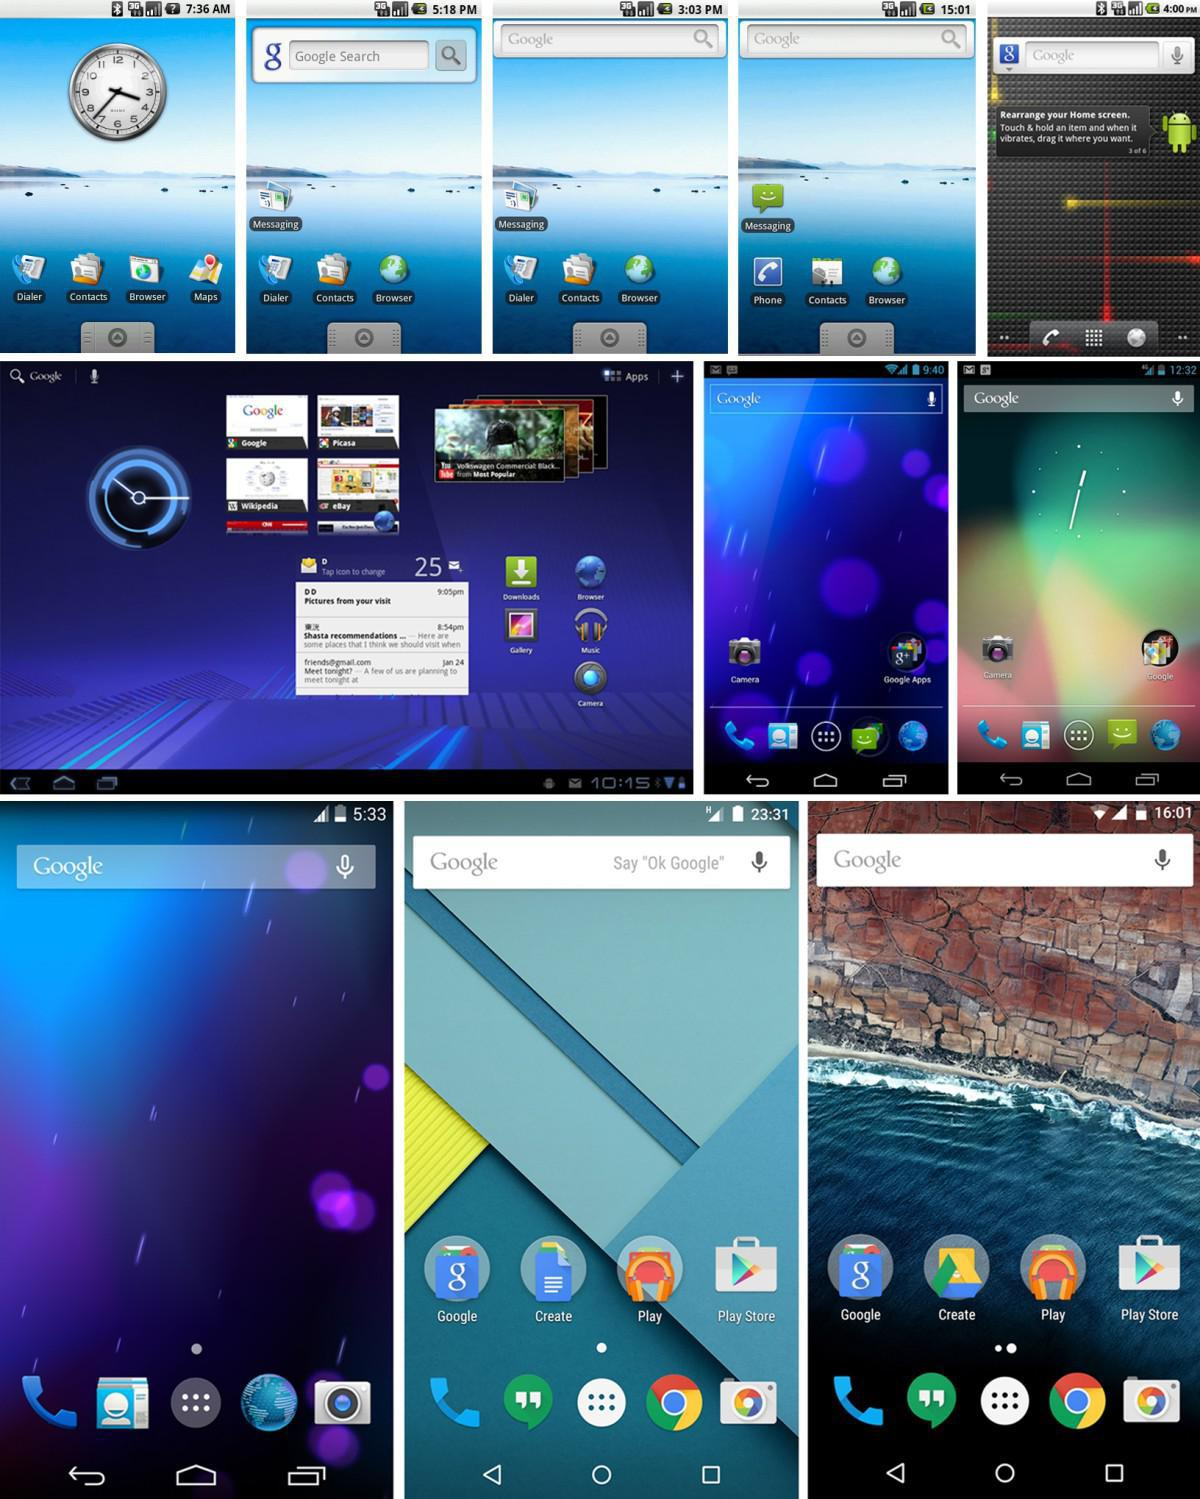 Vývoj Android OS